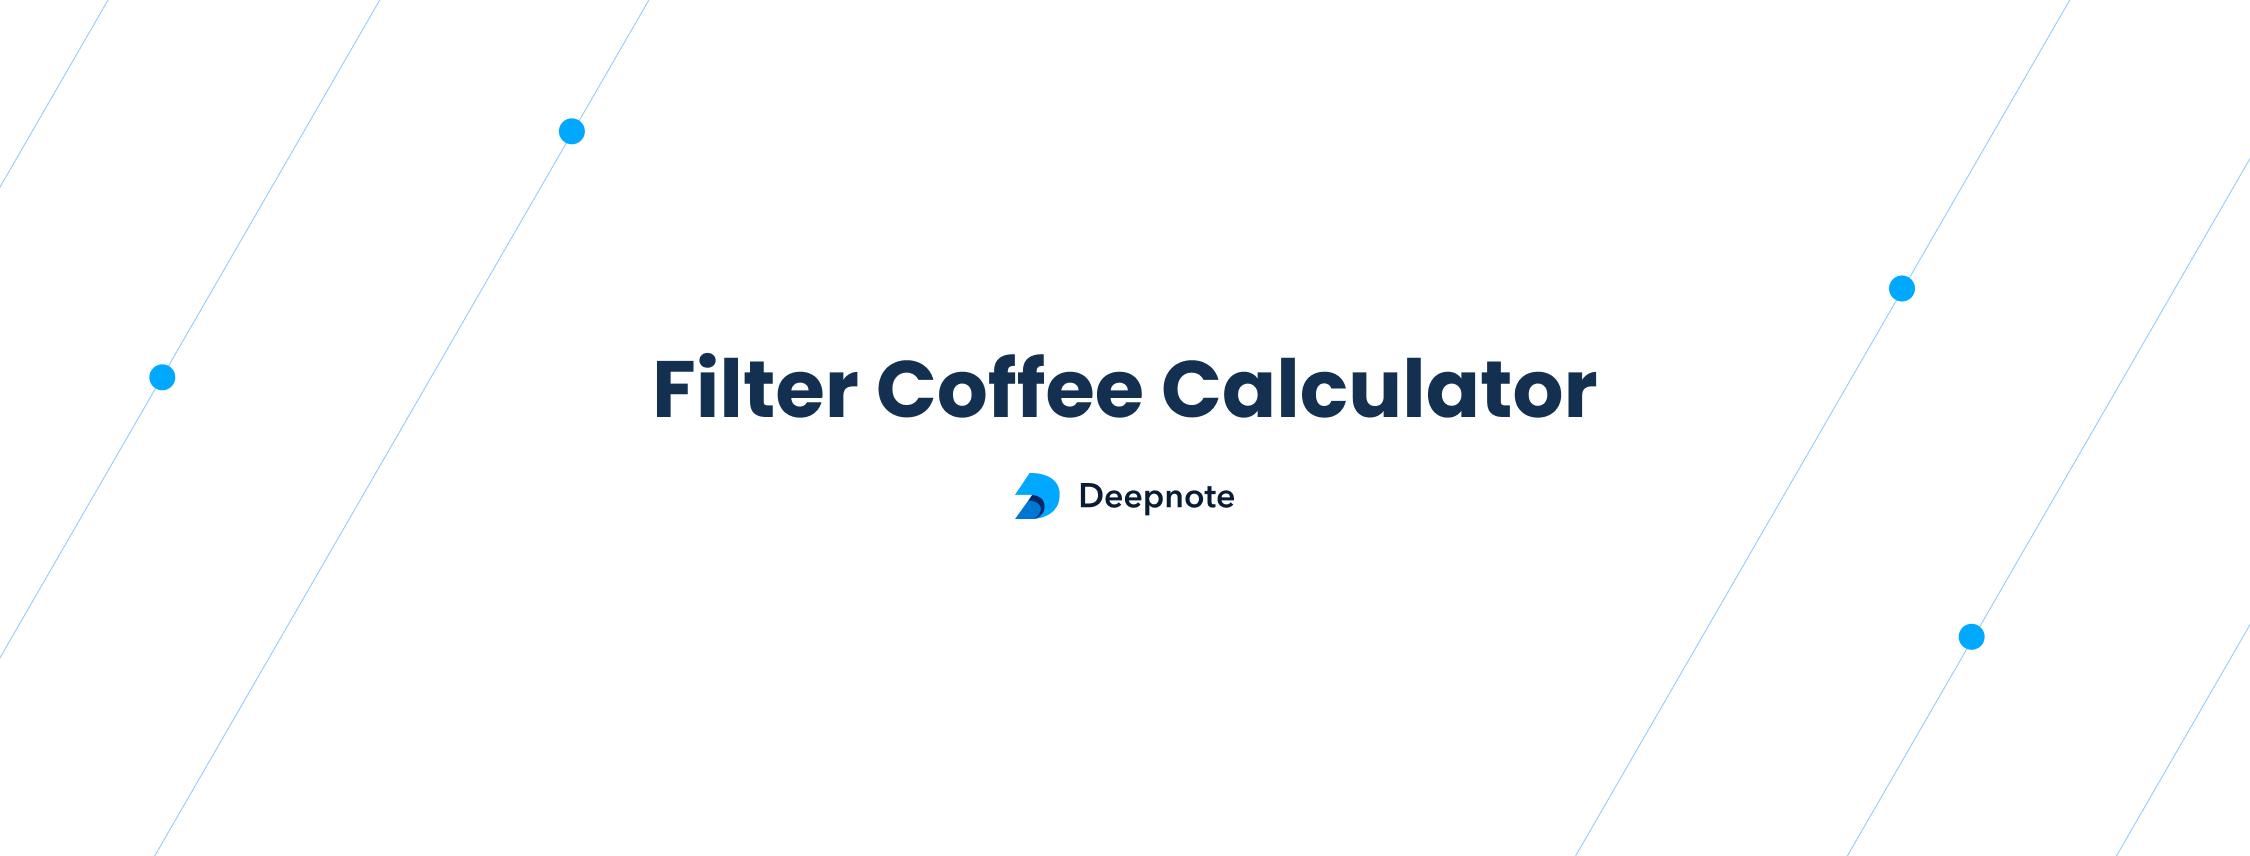 Filter Coffee Calculator –image